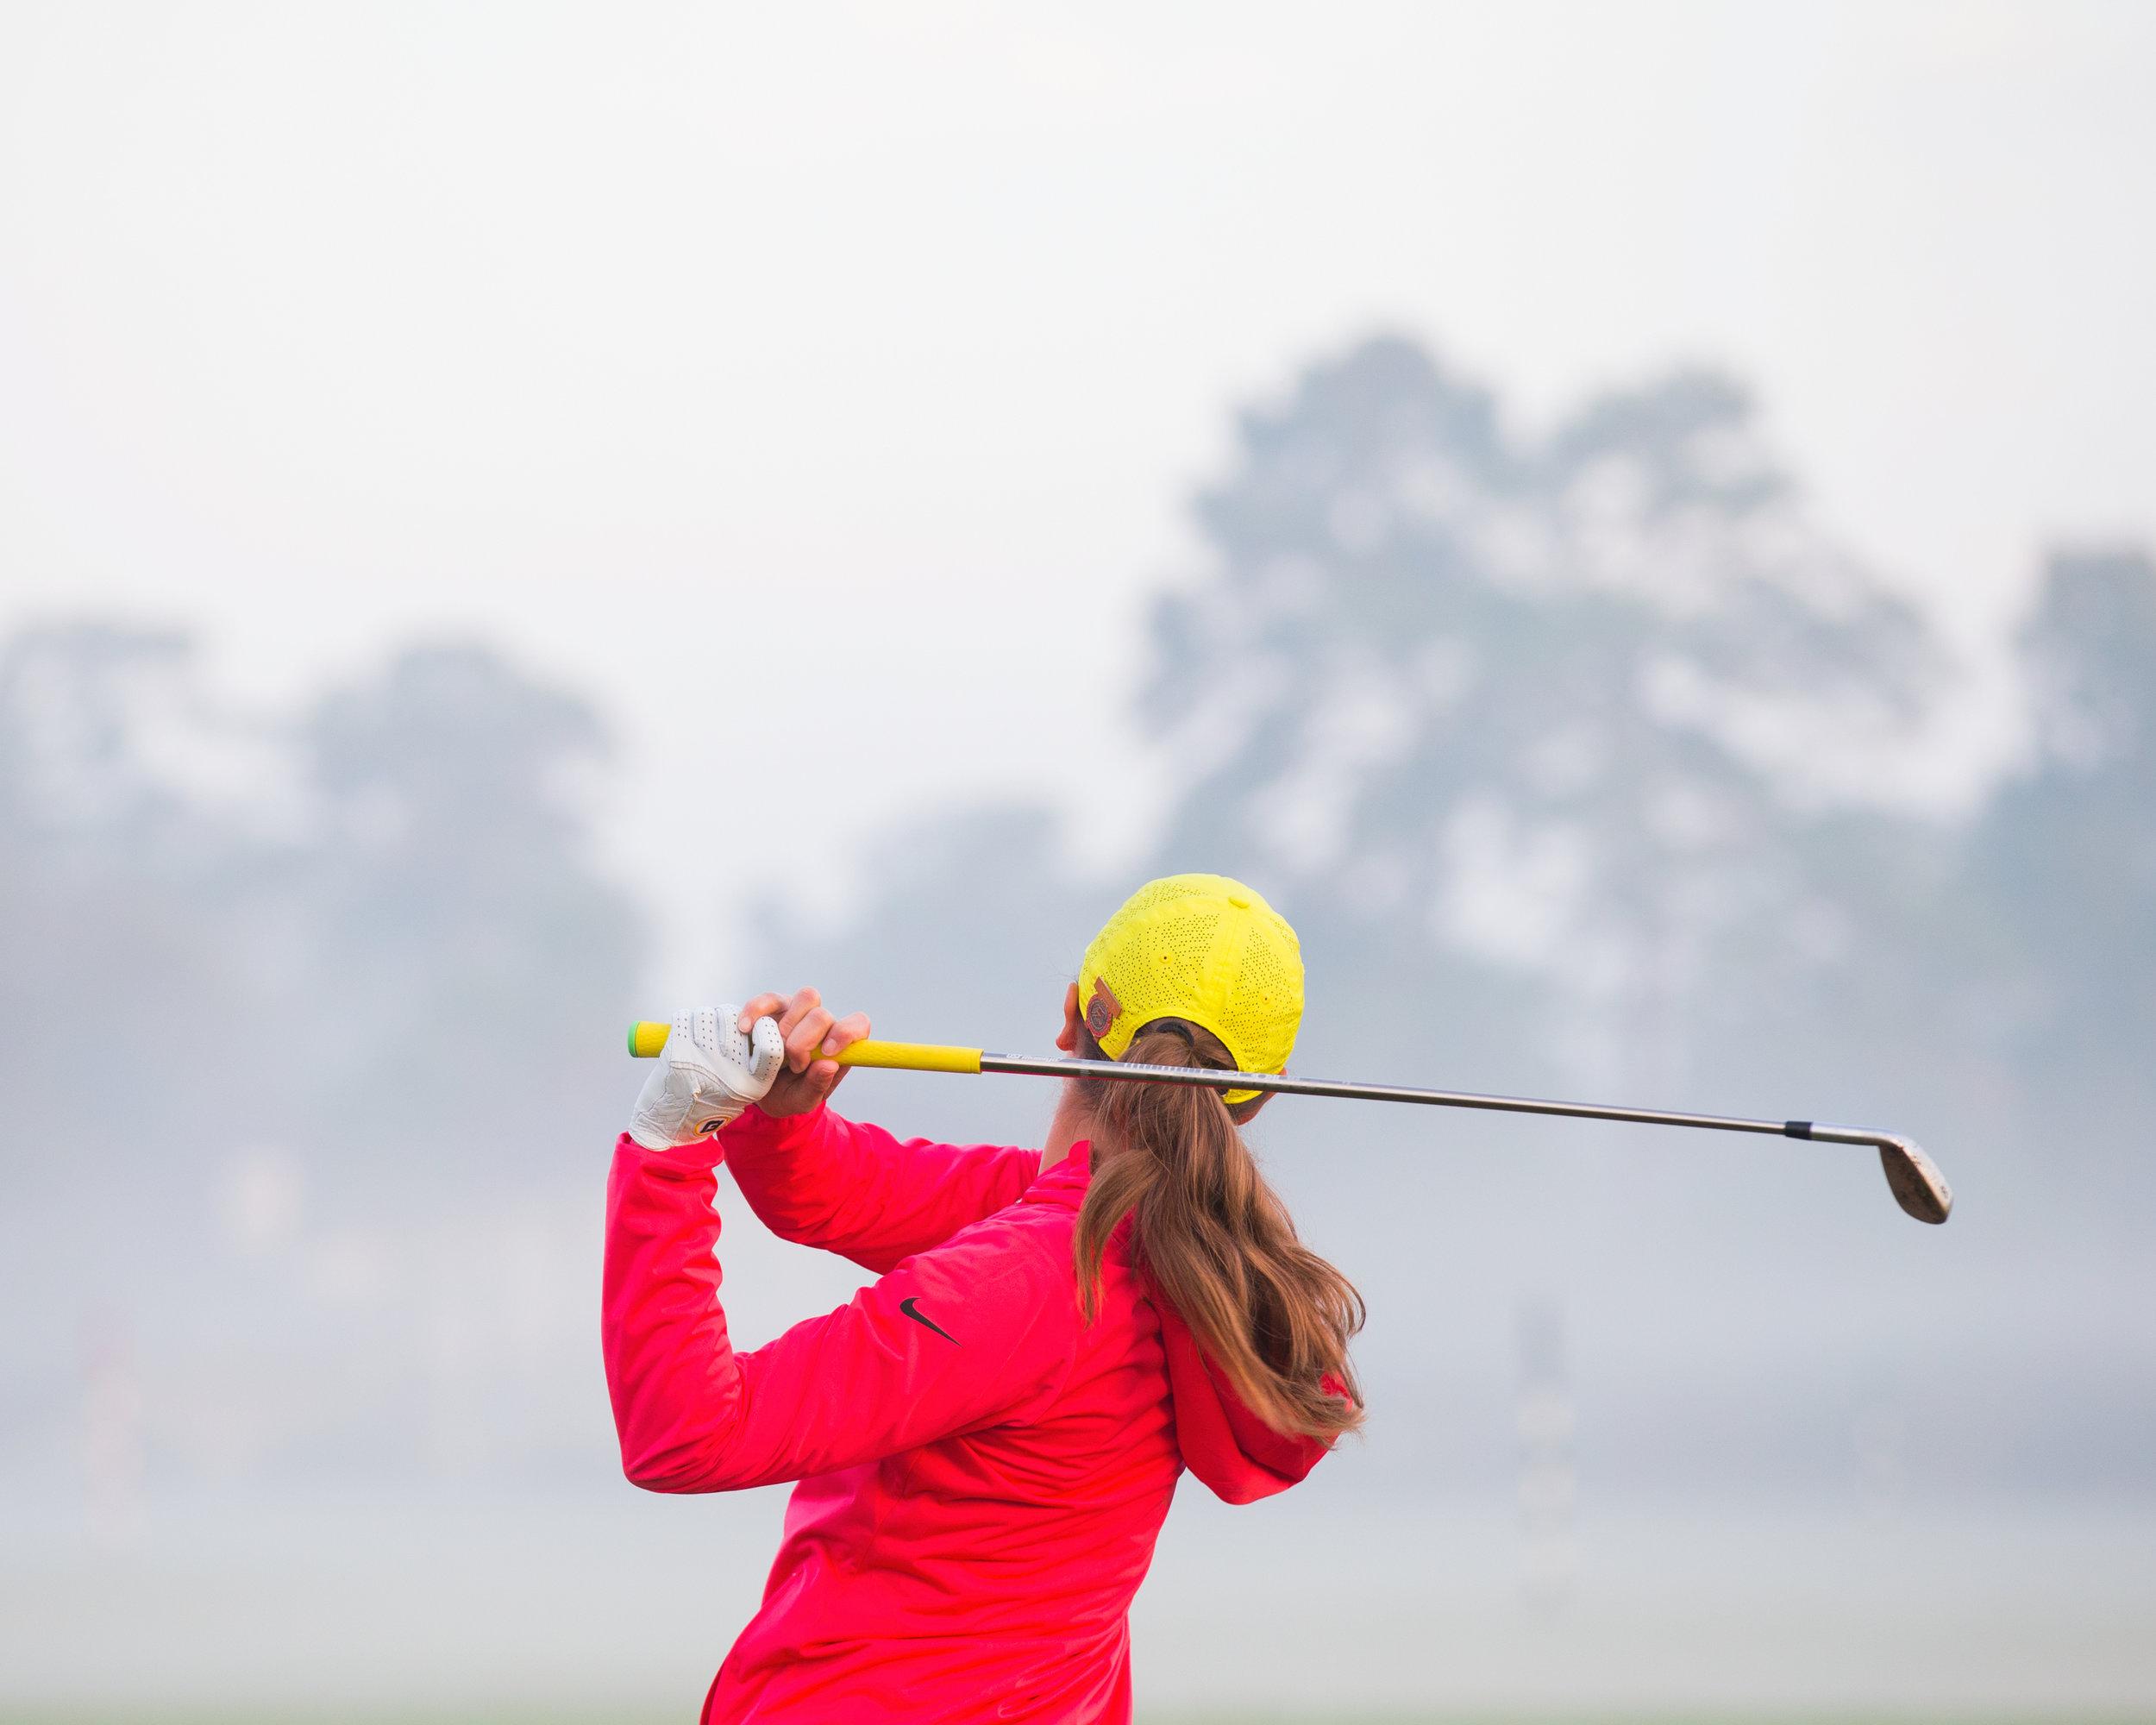 Olivia Herrick, 2017 U.S. Women's Mid-Amateur Championship. Champions Golf Club, Houston, TX. Canon 1DX, EF 70-200mm f2.8L